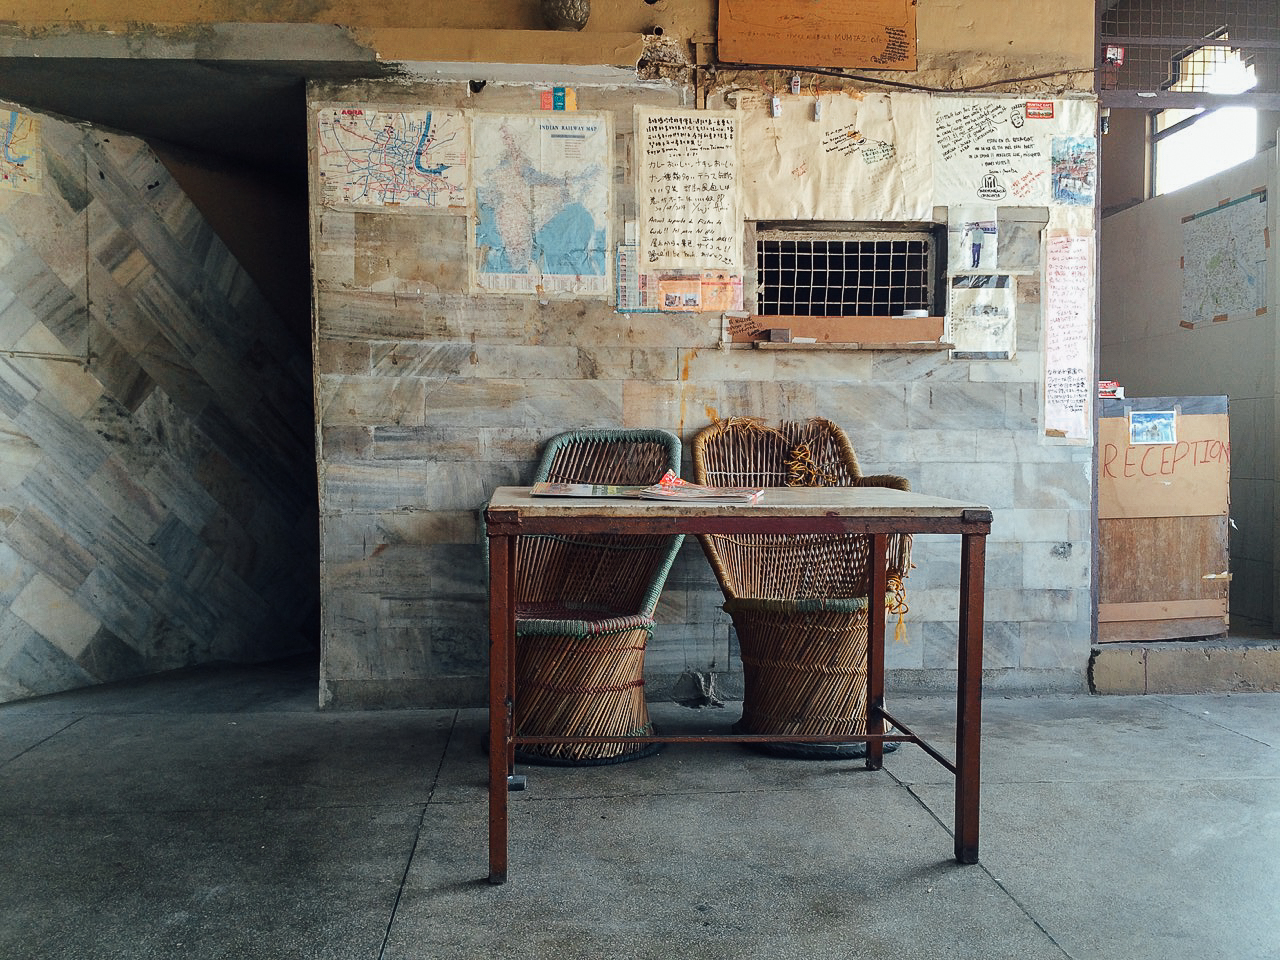 Путешествие по Индии: кафе на крыше, Агра